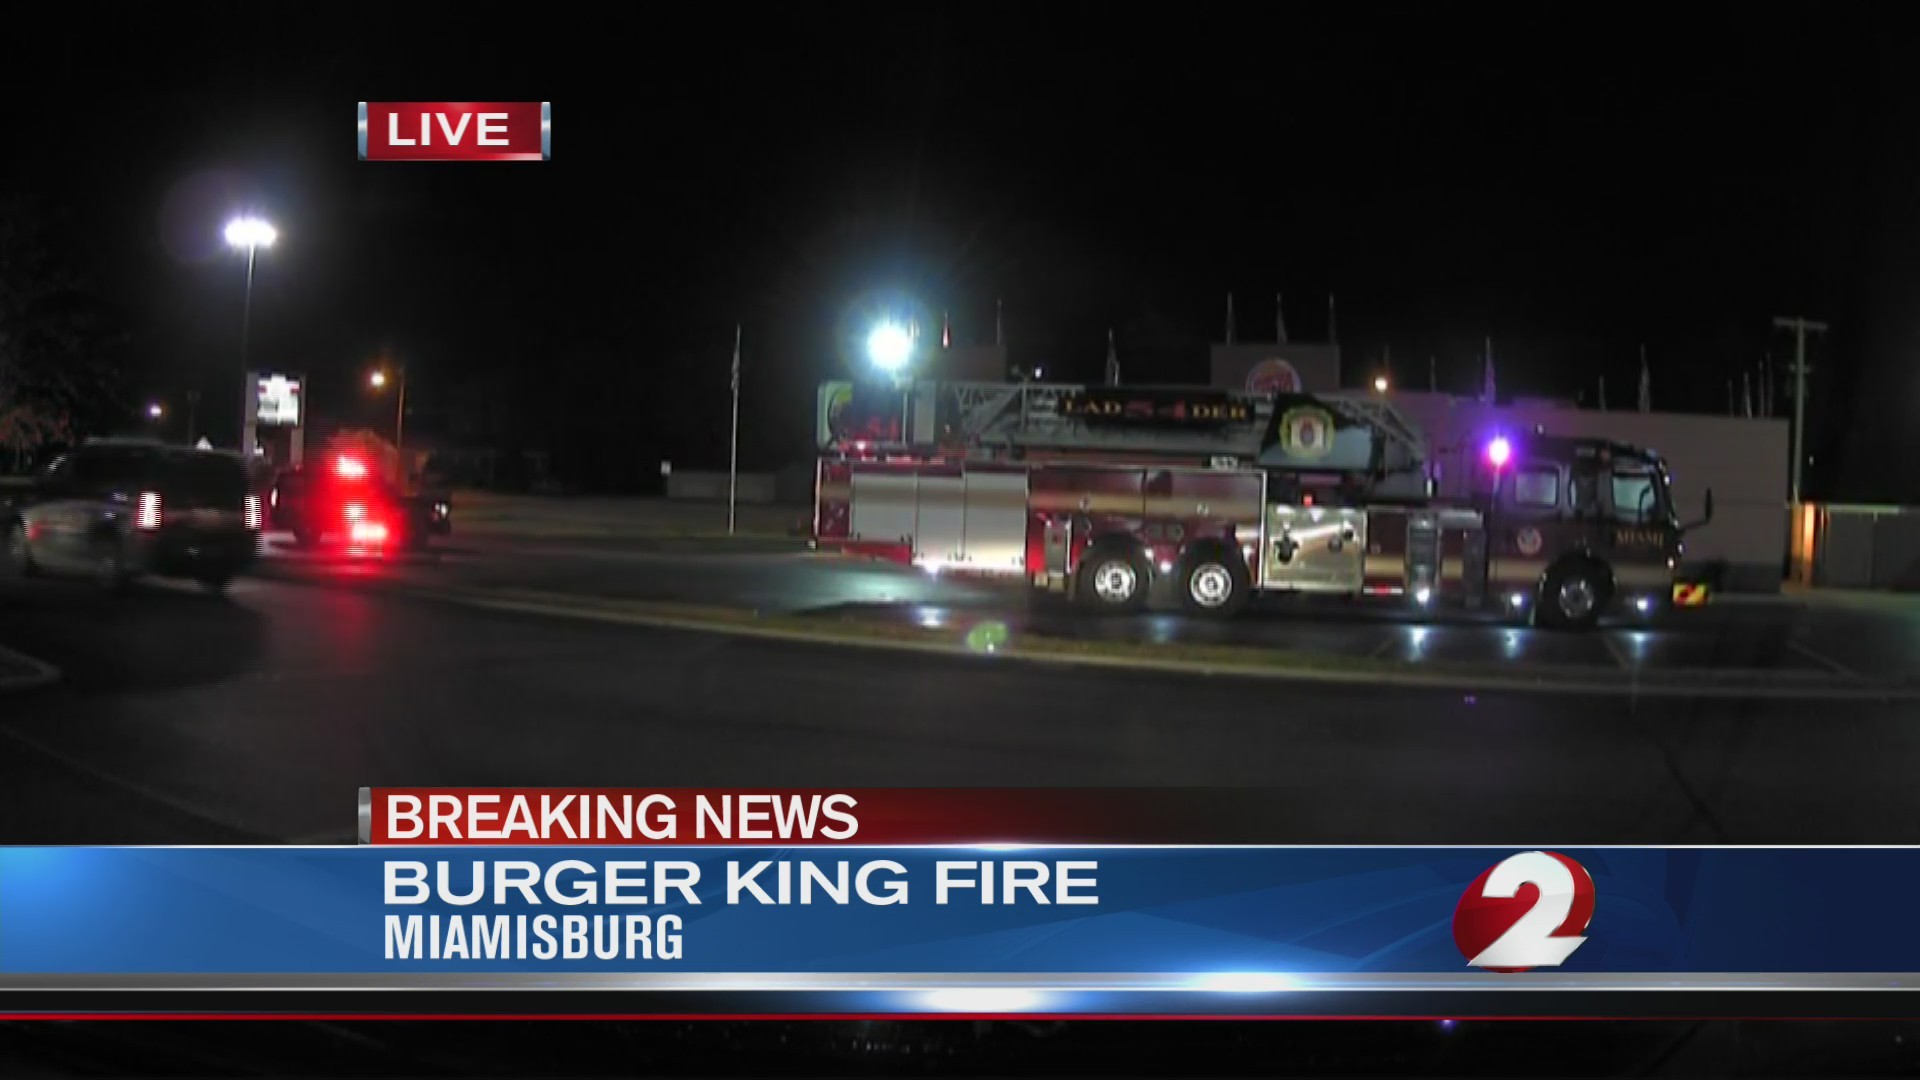 Miamisburg Burger King fire